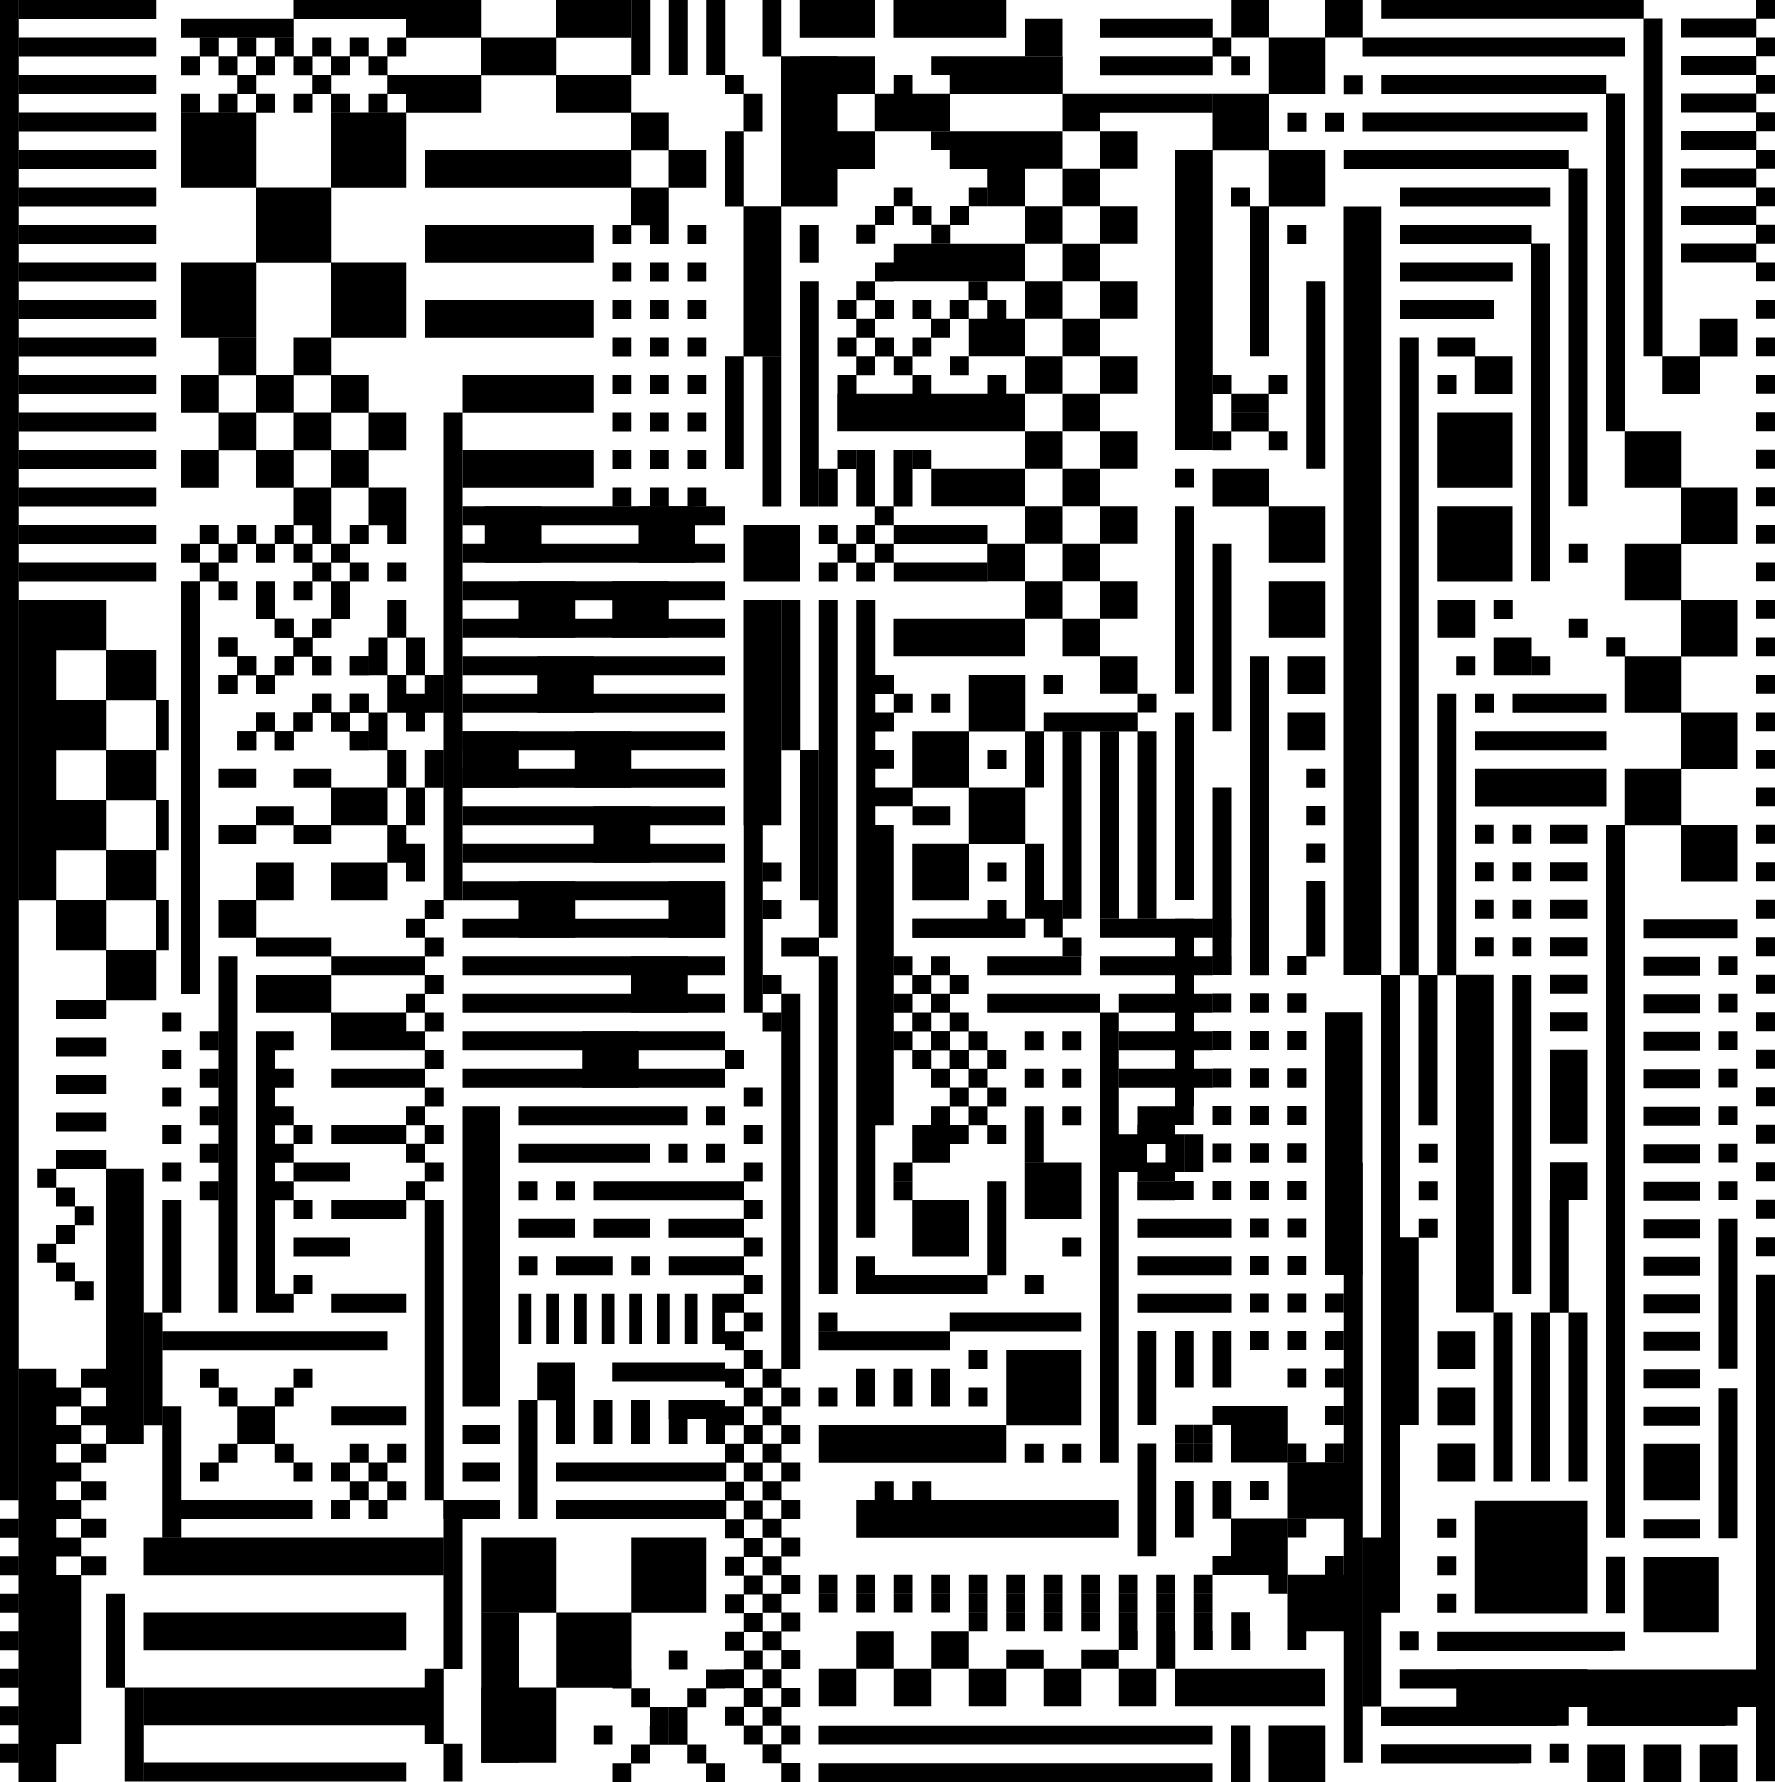 Barcodes 5-01.png